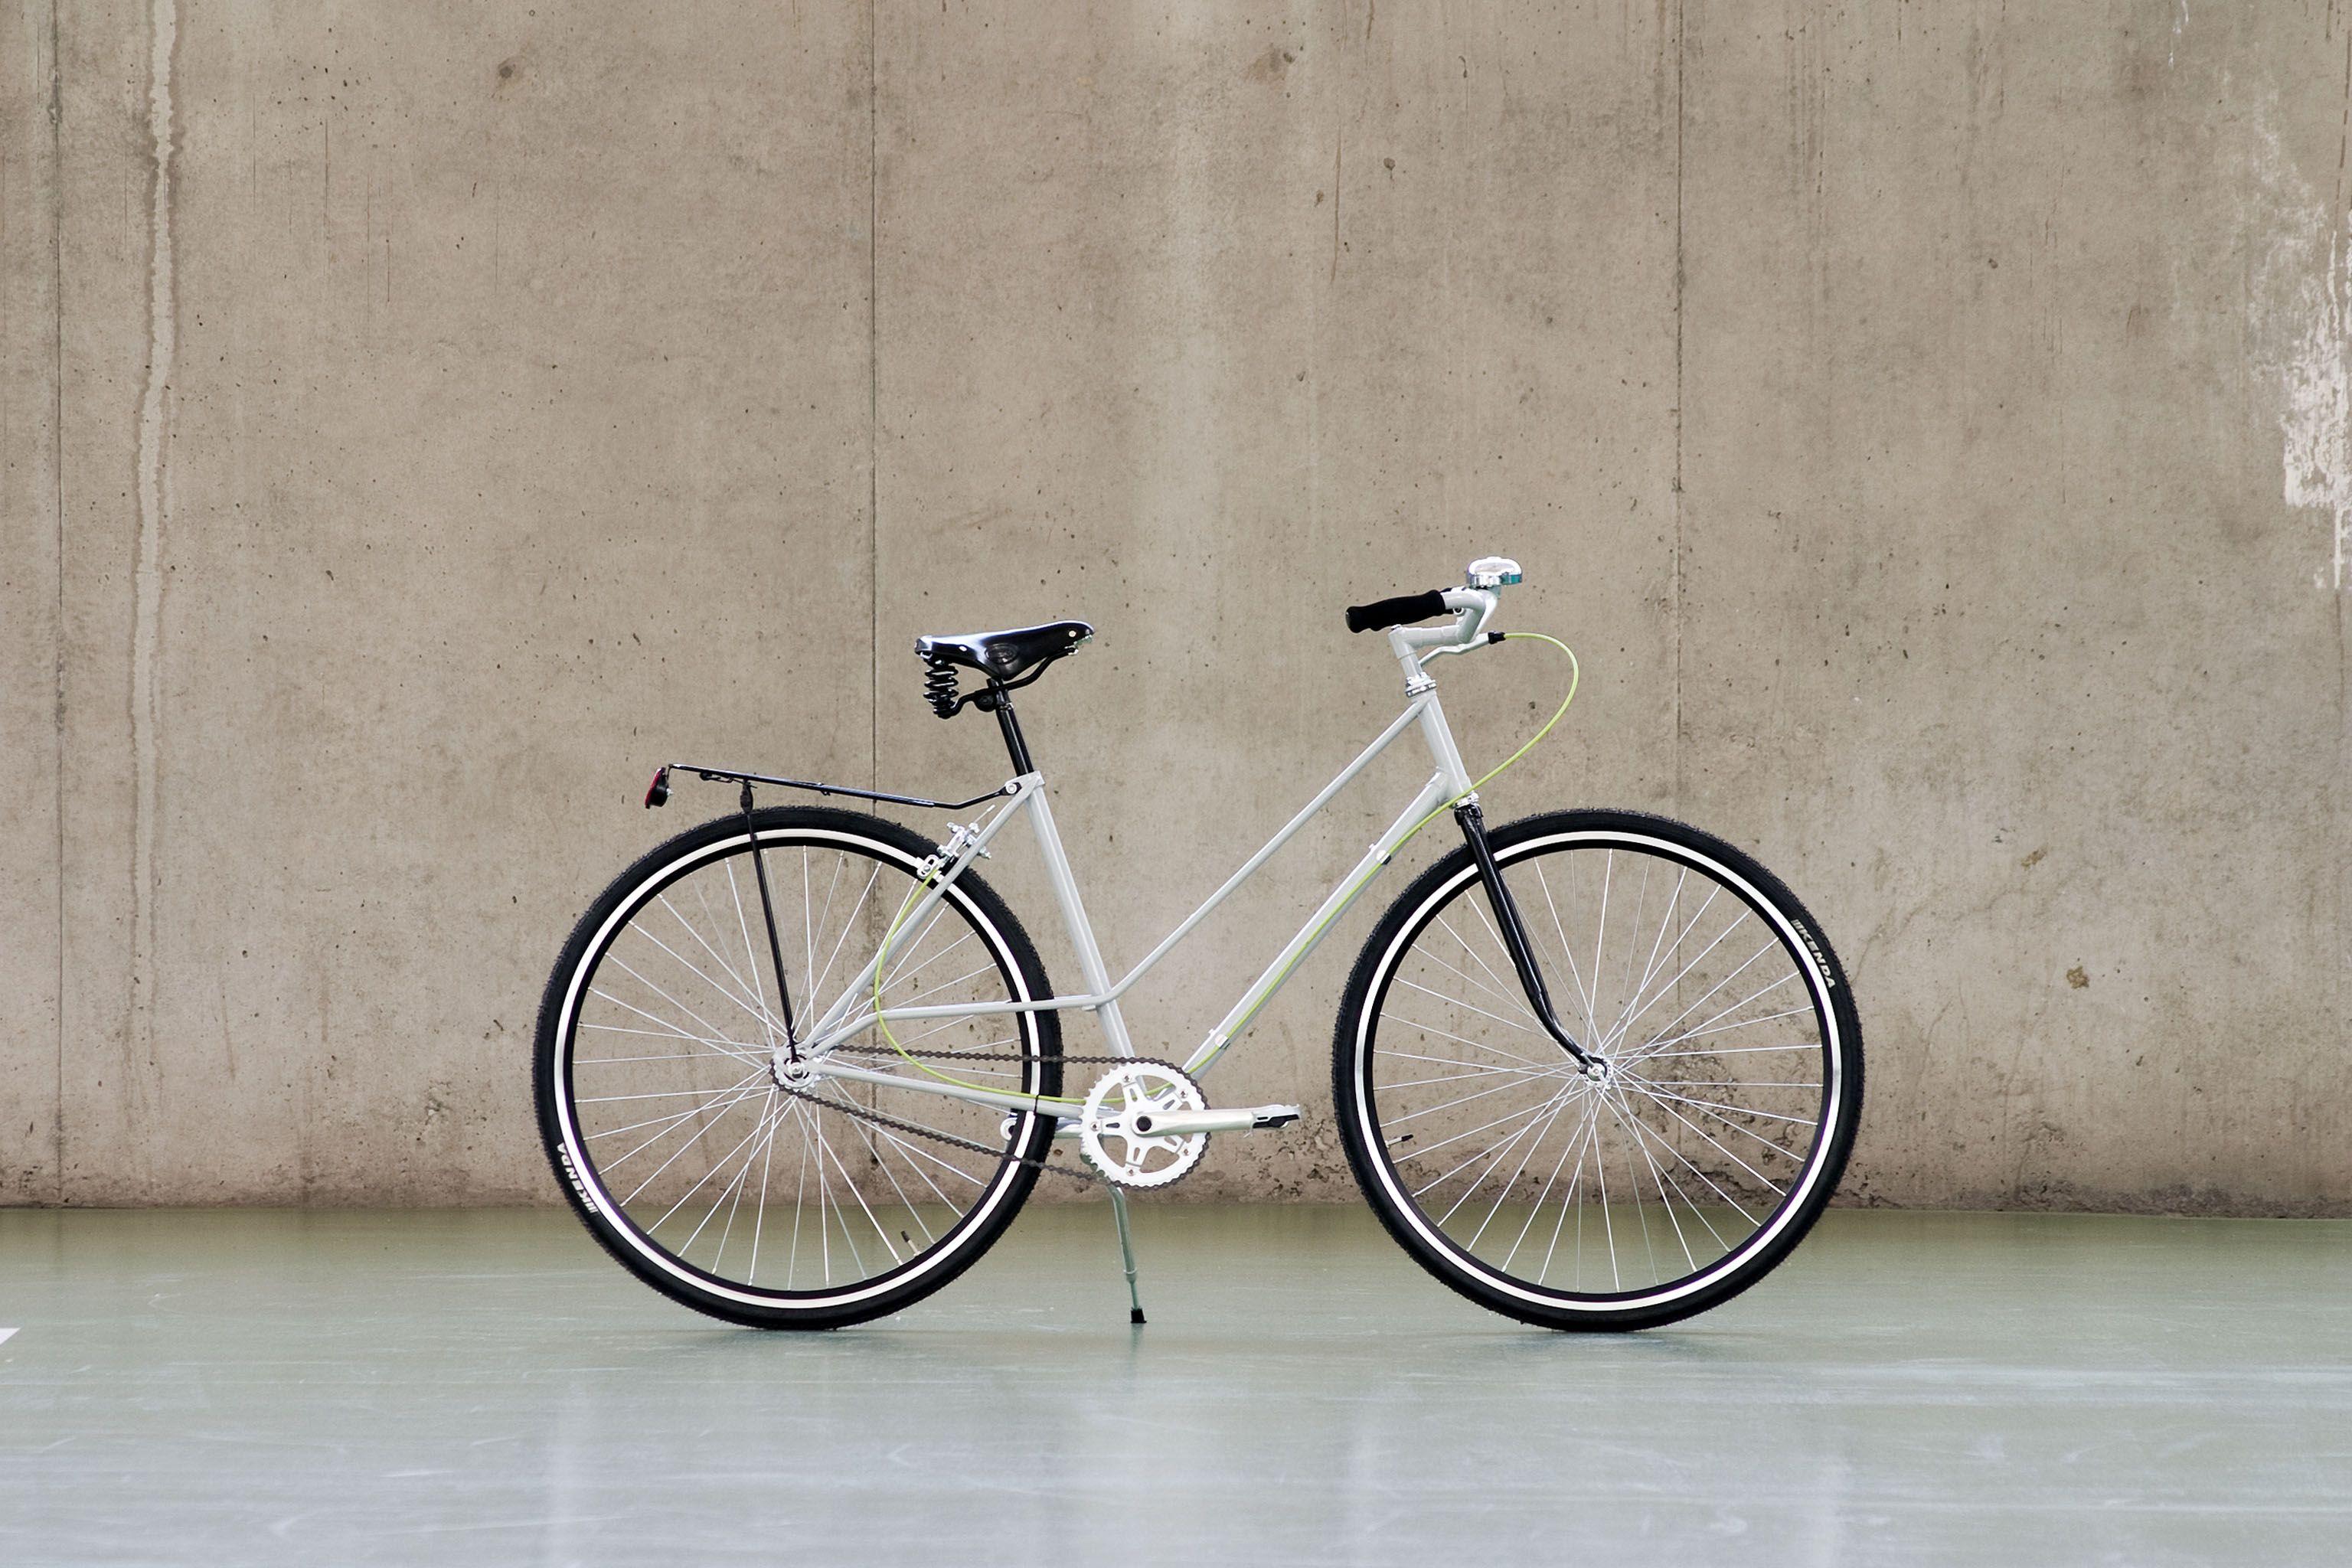 VolBi / Chilean Beauty / Velocommute Bike / Fontana '80